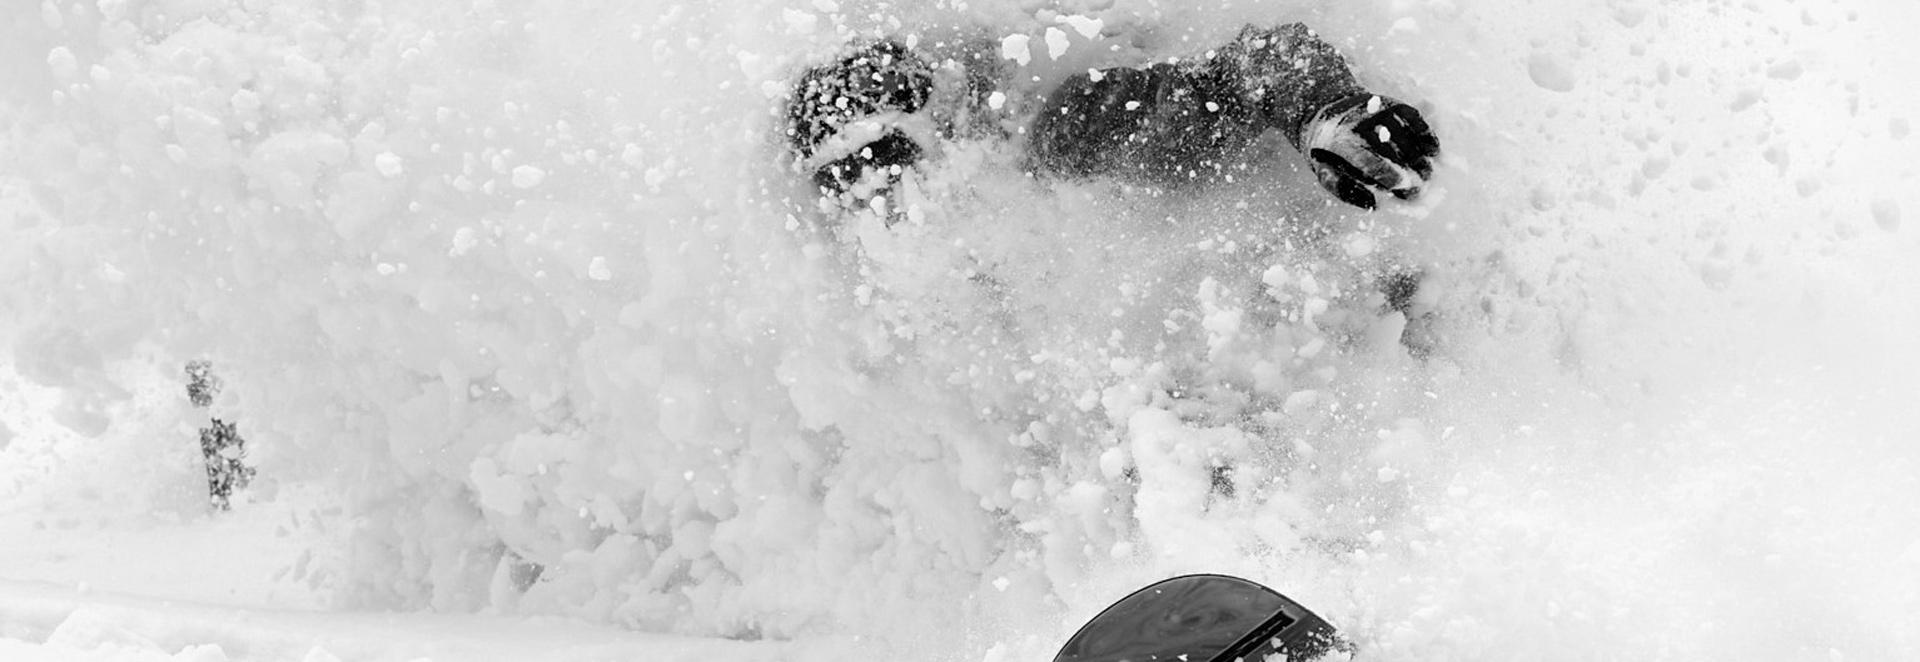 Ski & Snowboard dans la neige poudreuse - Kodama Lodge - Japon - Accueil